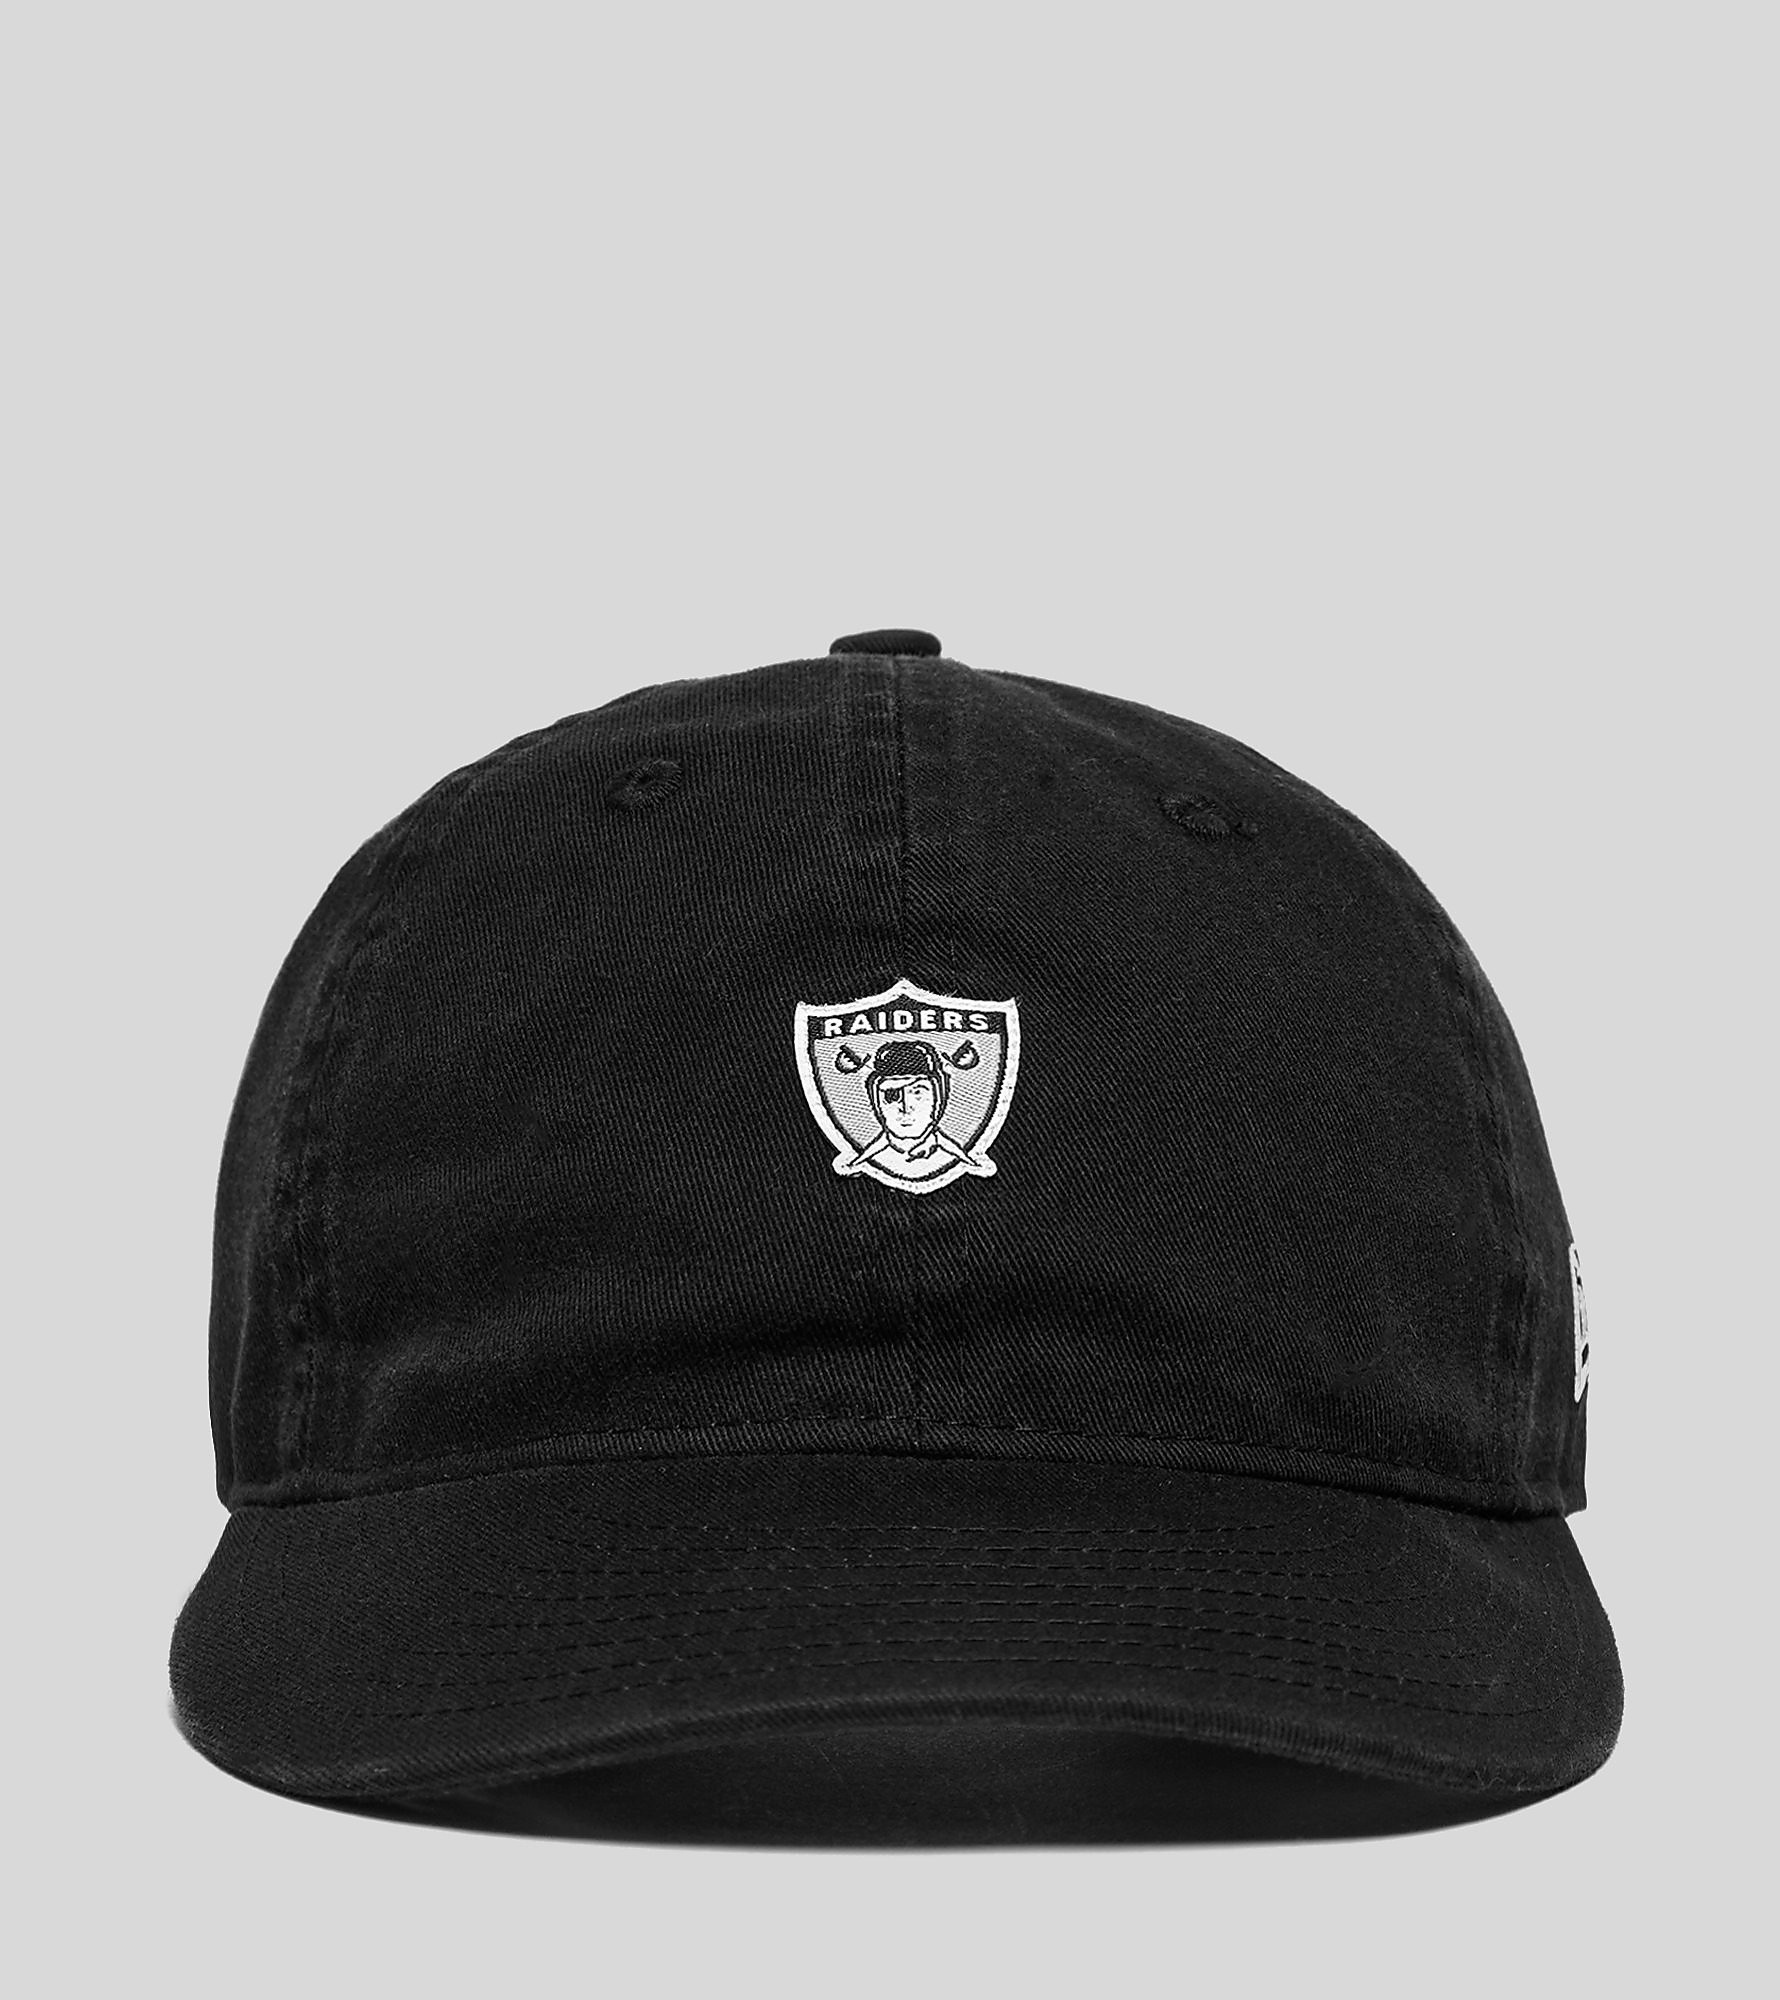 New Era 9FIFTY U Raiders Cap